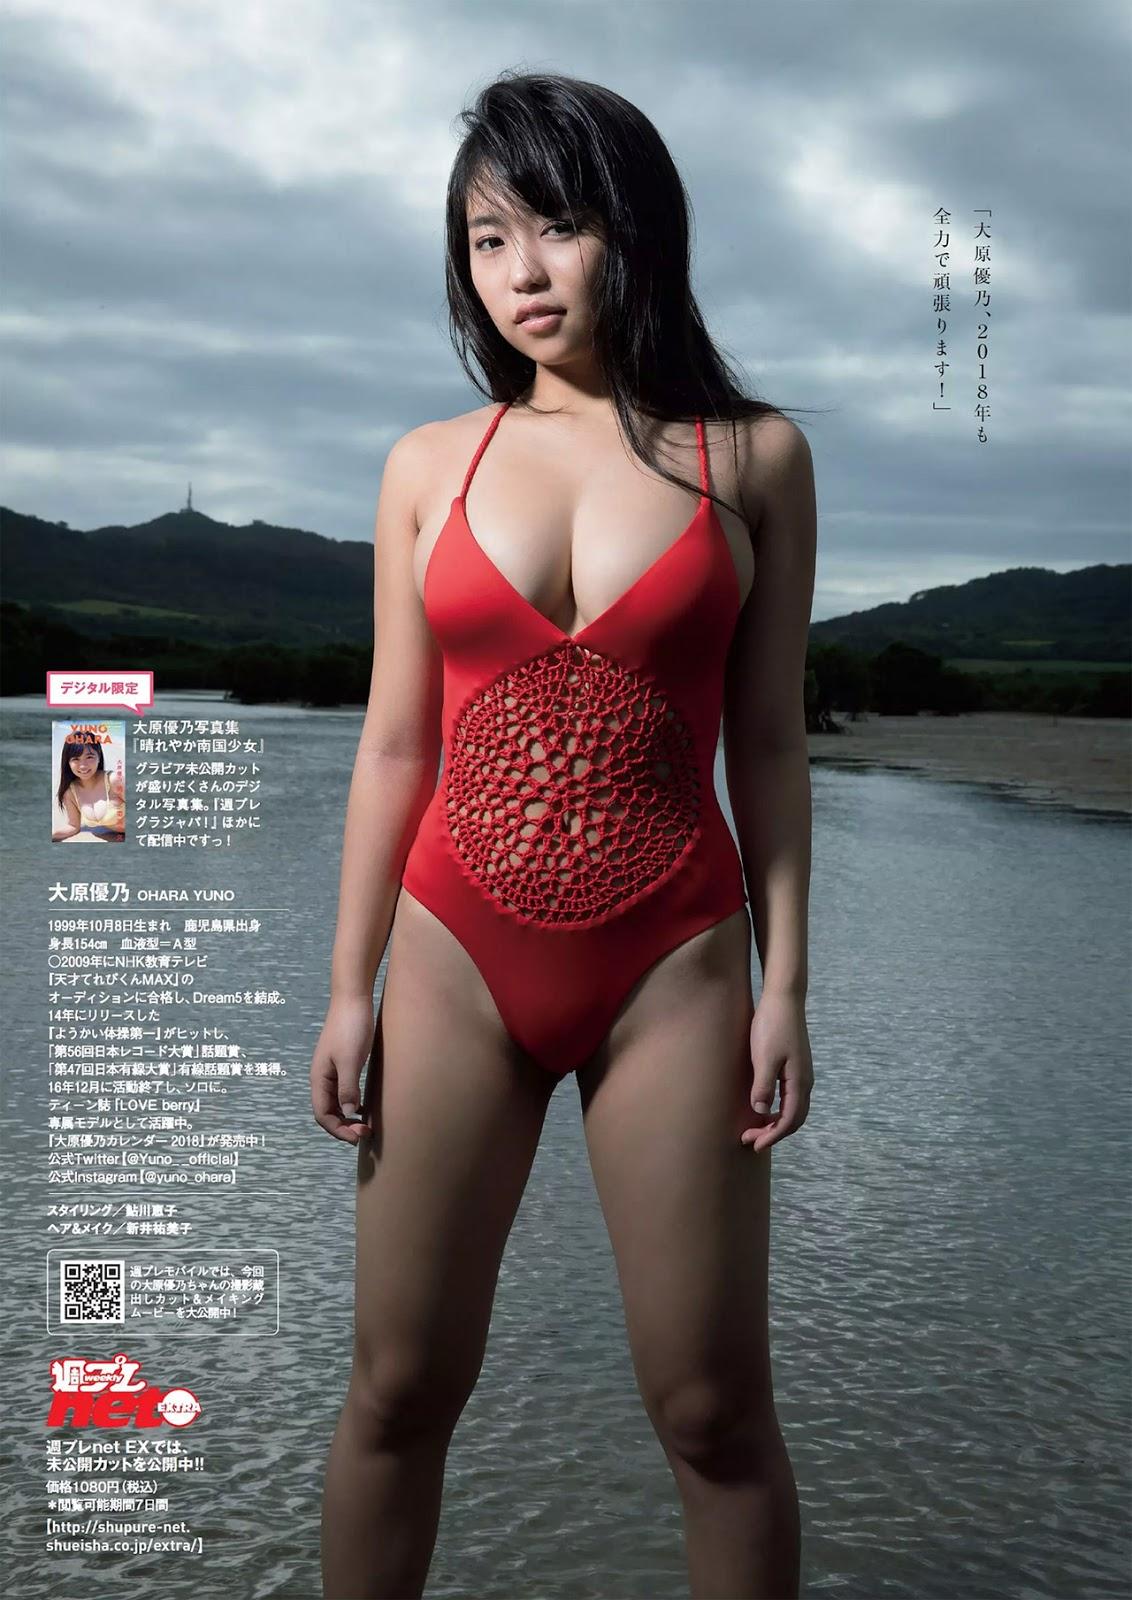 Ohara Yuno 大原優乃, Weekly Playboy 2018.01.08 No.01 (週刊プレイボーイ 2017年1月8日号)